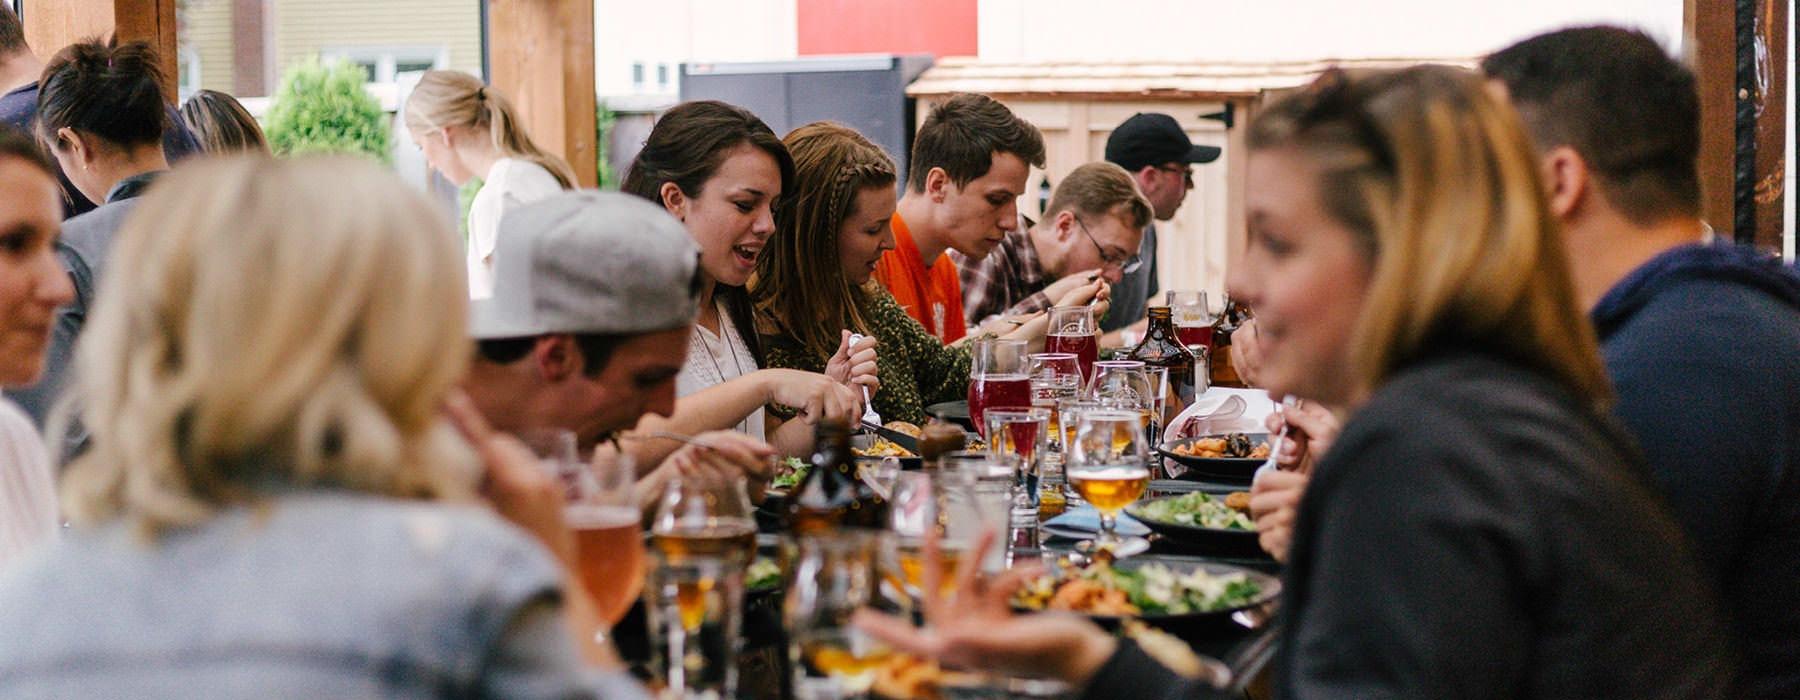 people talking and eating at neighborhood restaurant